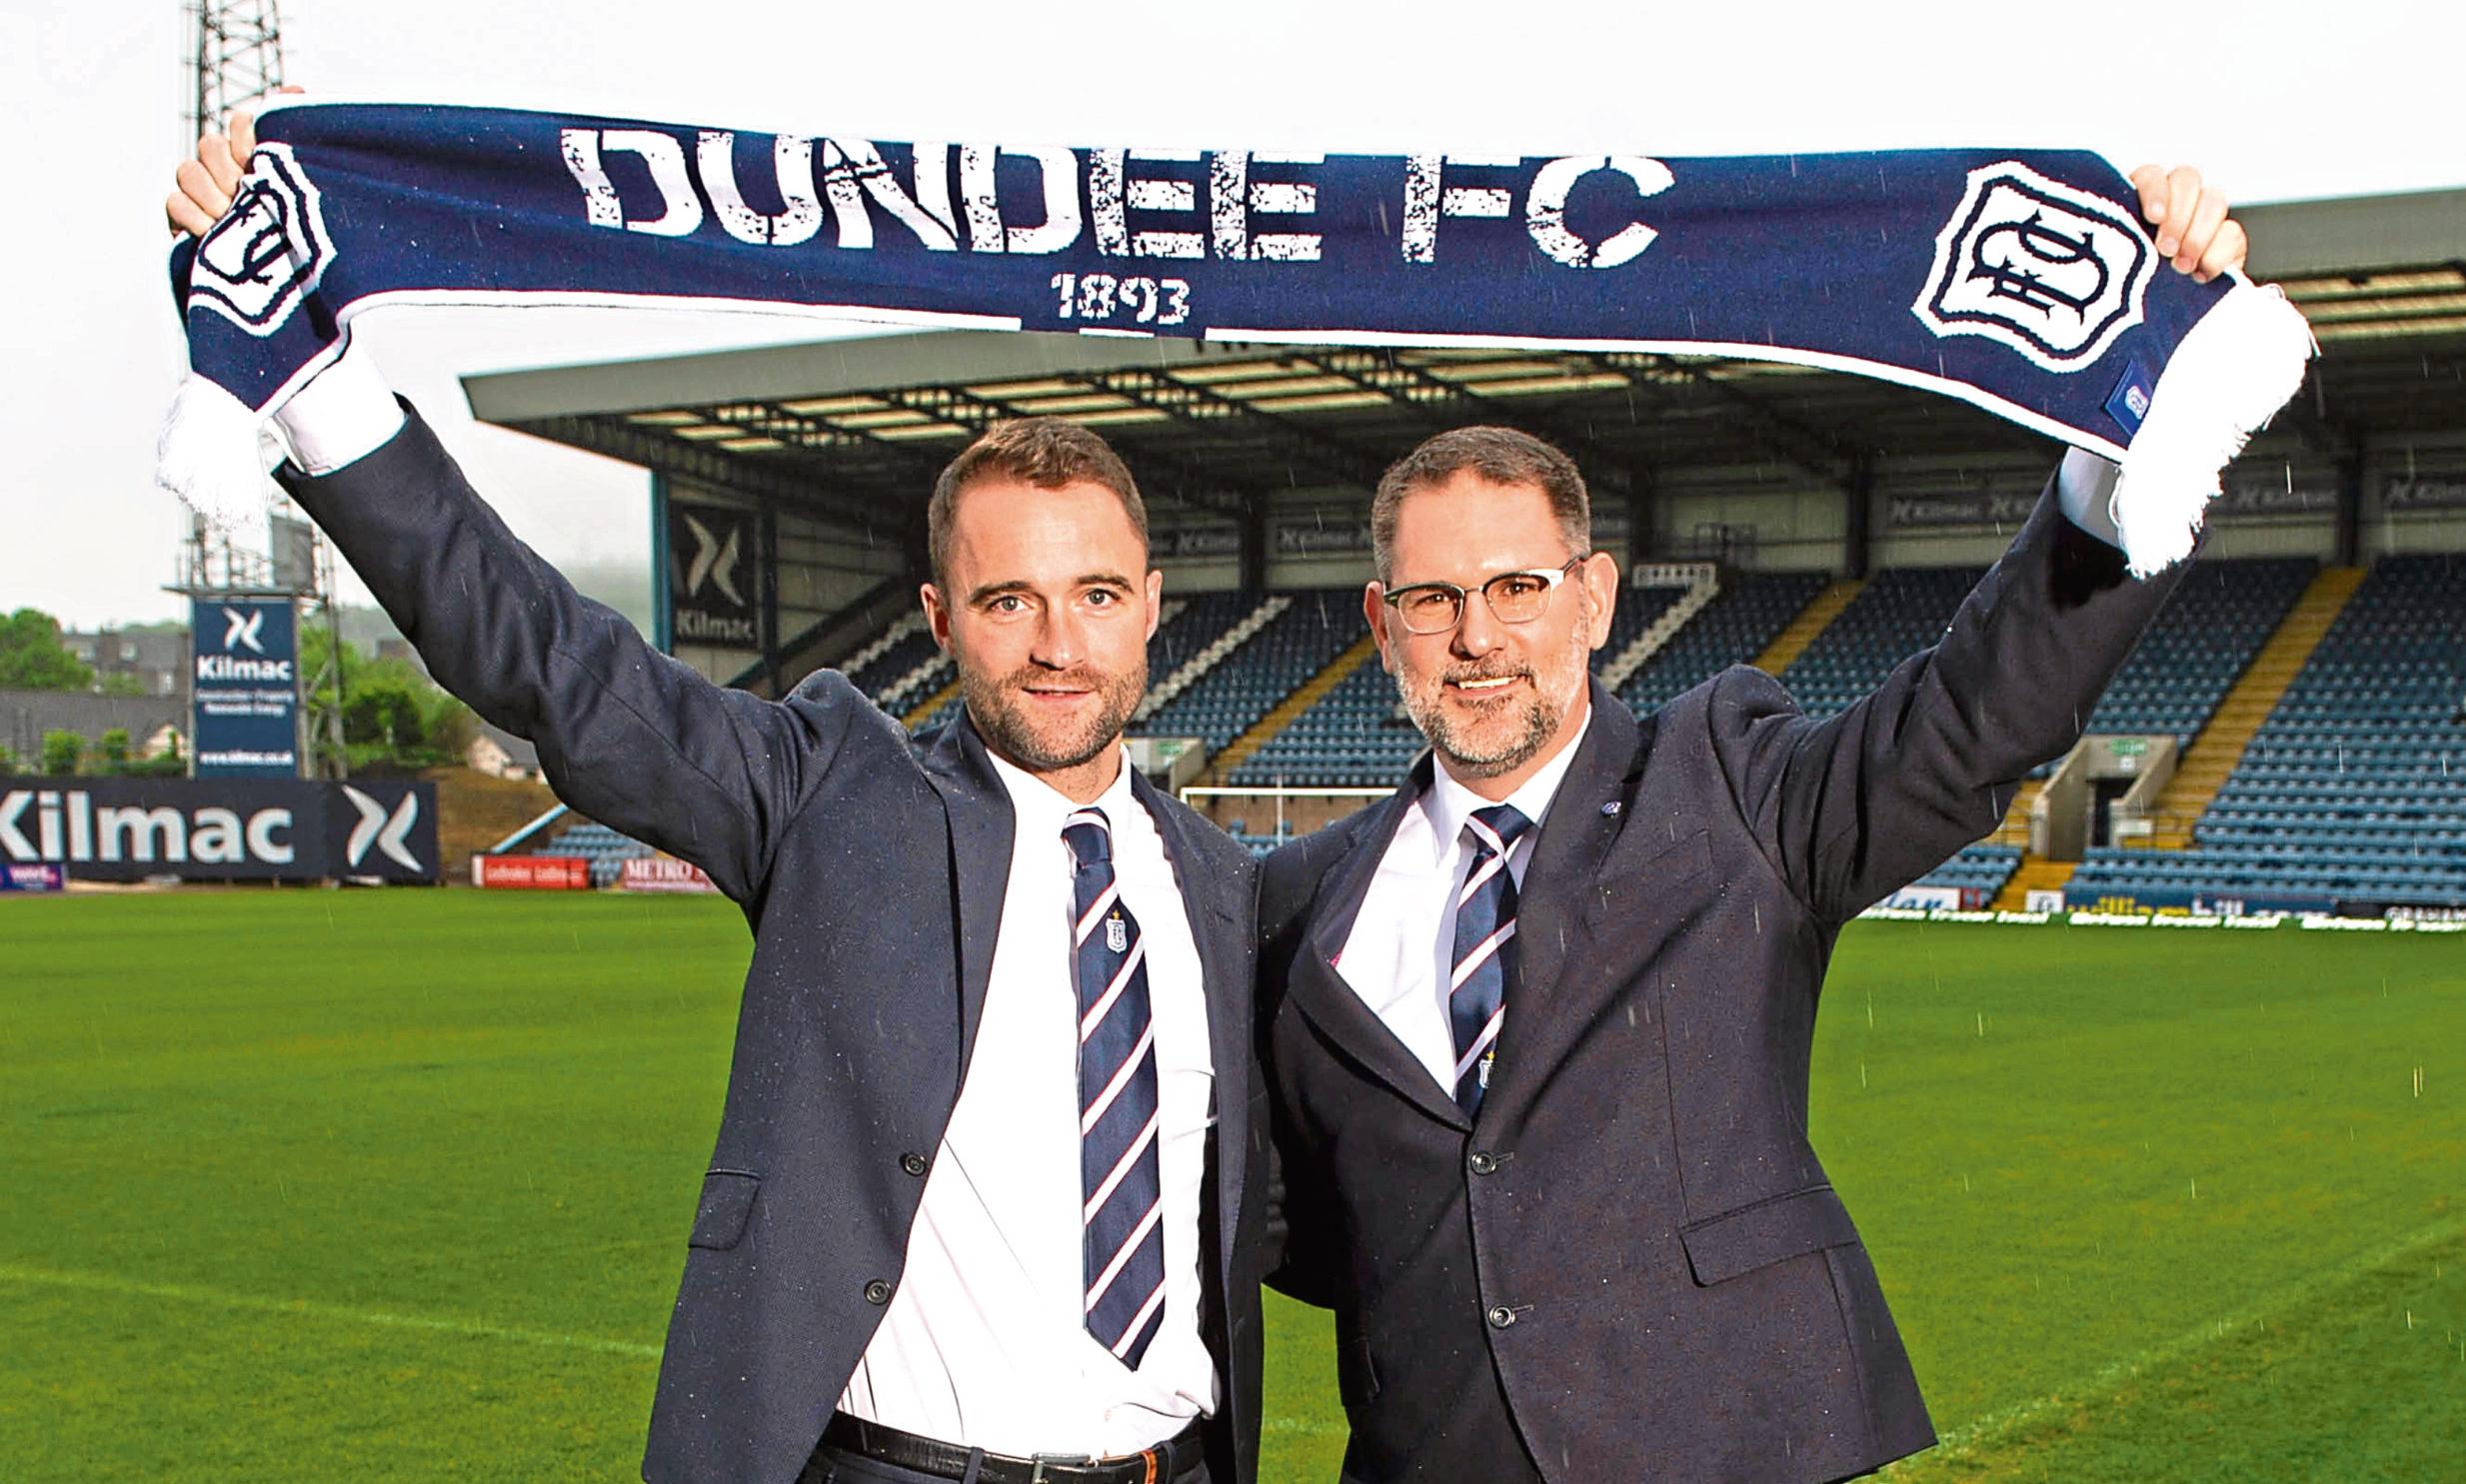 Dundee boss James McPake and managing director John Nelms.